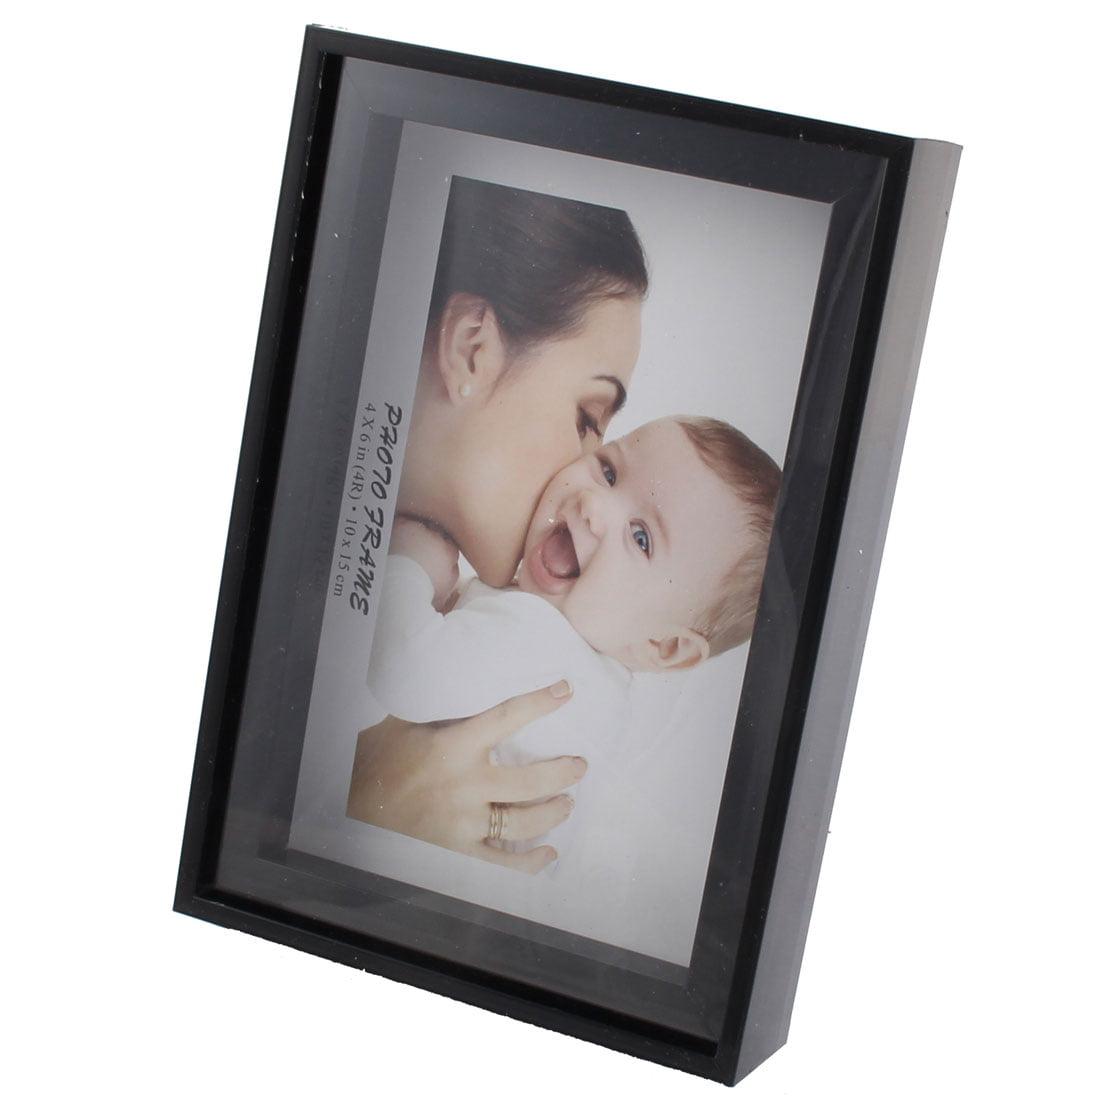 unique bargains home decor display picture photo frame decor bargain barn